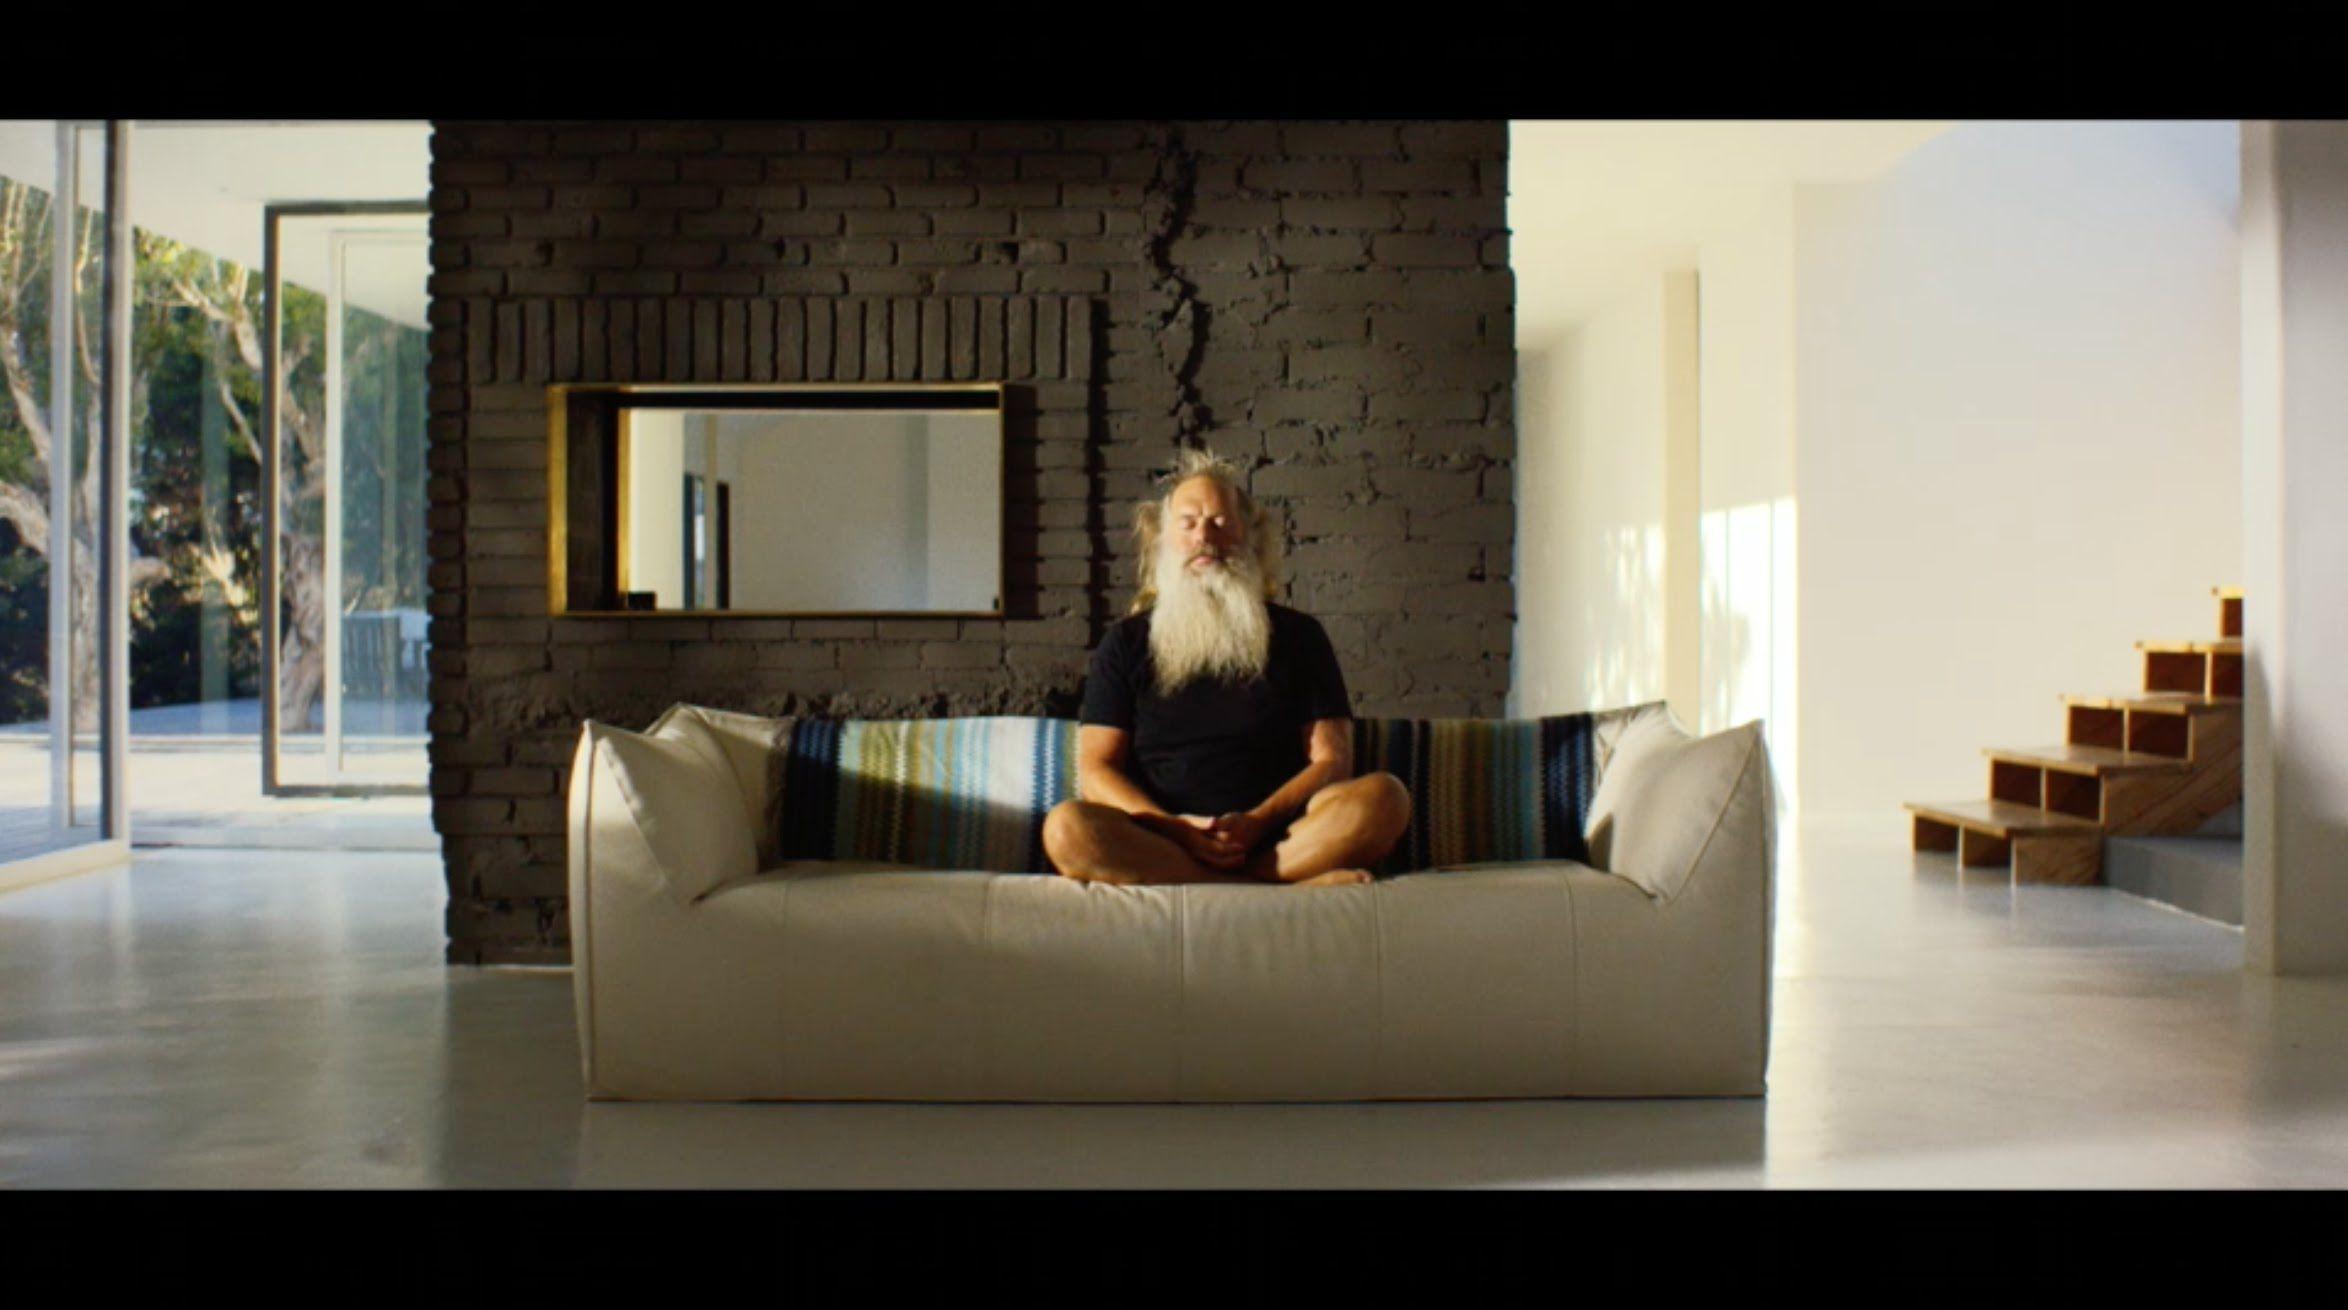 Sonos Tv Commercial Rick Rubin Tunes His Home Sonos House Beautiful Kitchens Sonos Tv